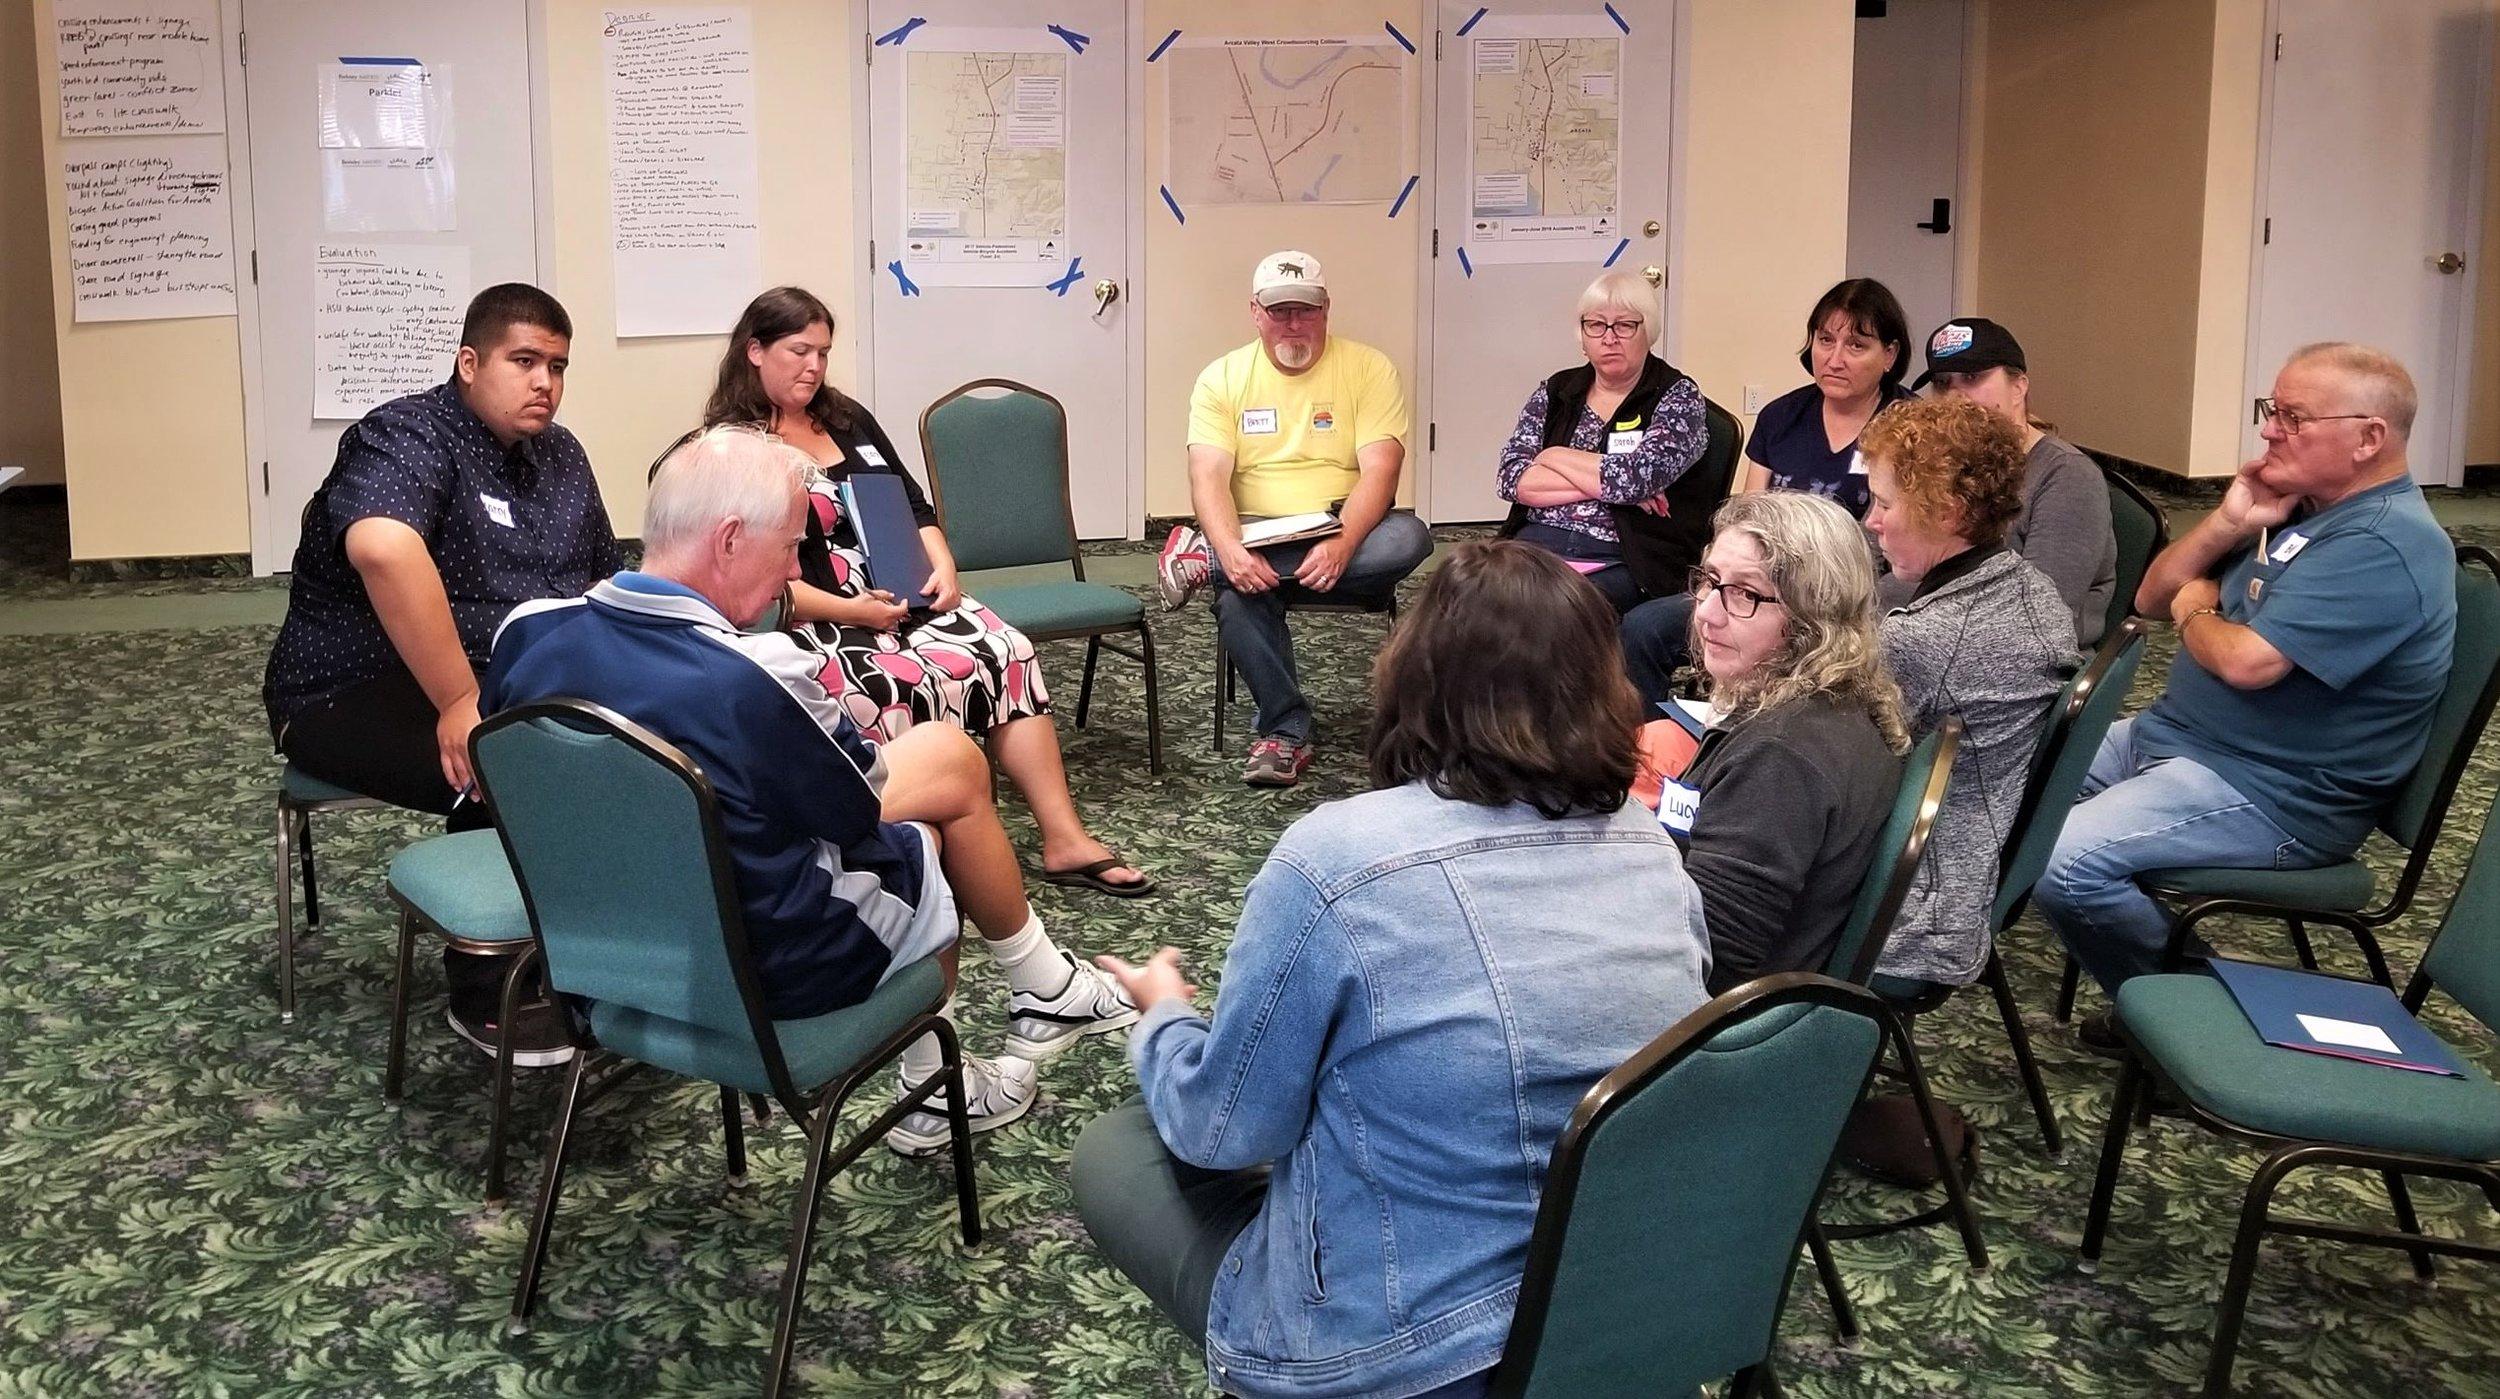 Participantes del taller CPBST en Valley West Arcata conversan sobre prioridades para caminar y andar en bicicleta.